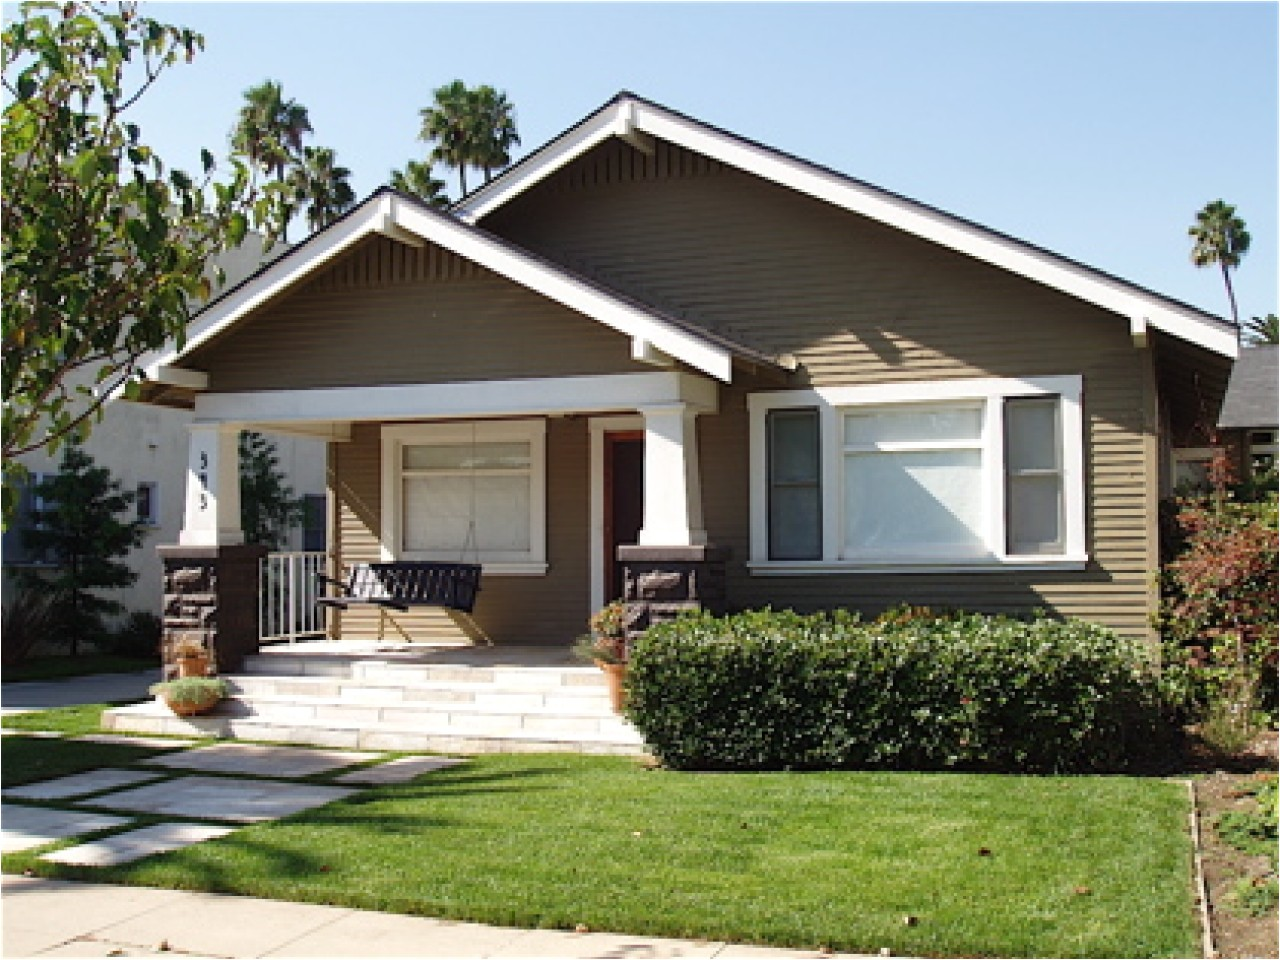 c8de49b5c60f0af4 california craftsman bungalow style homes old style bungalow home plans